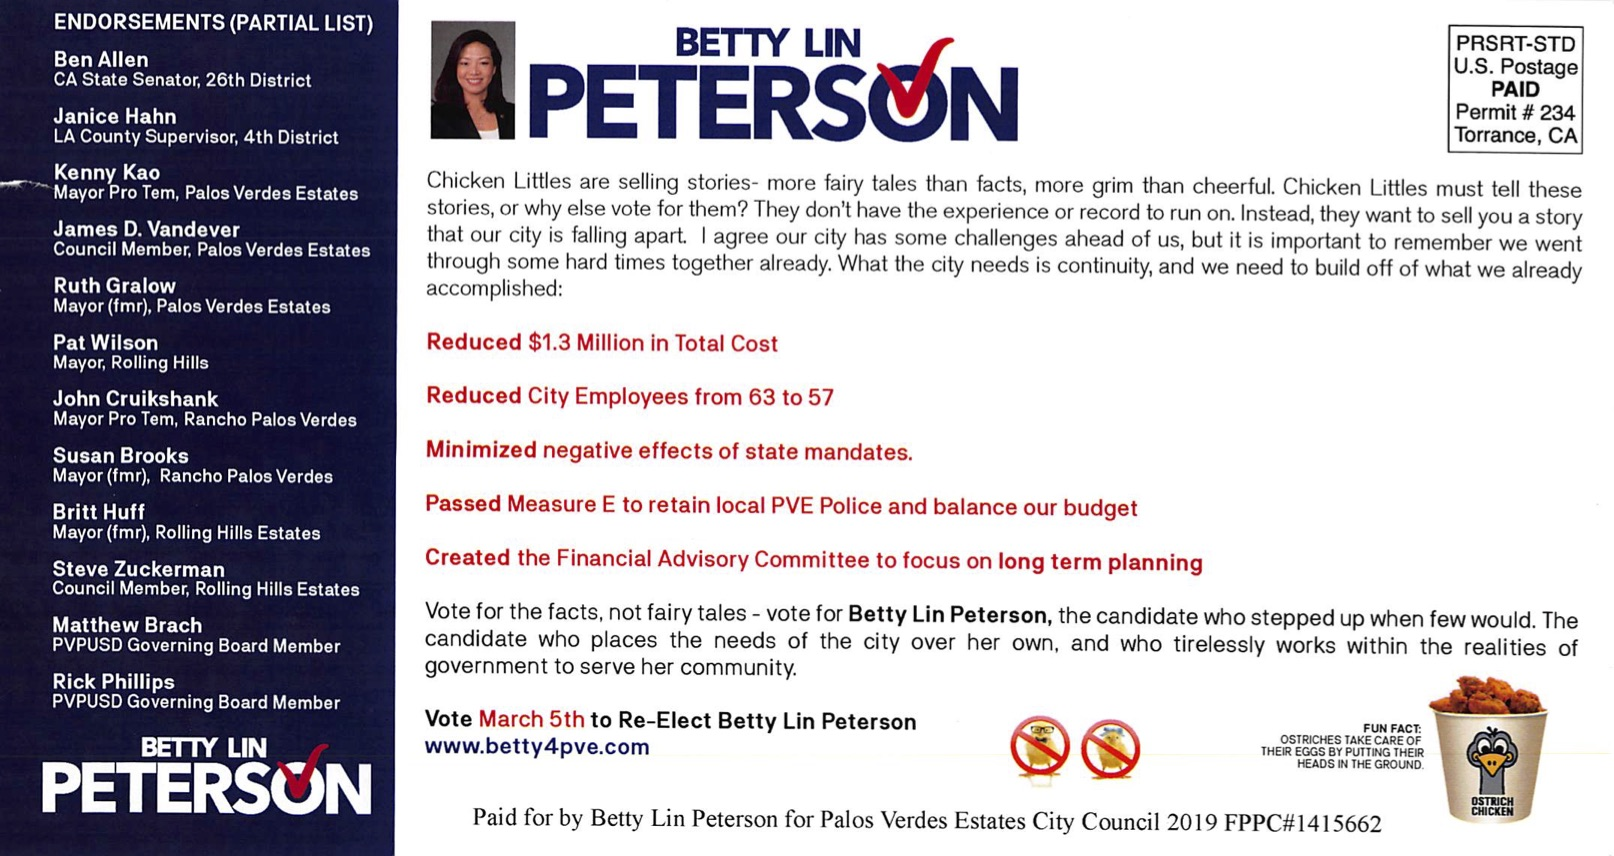 Peterson 2b.jpg